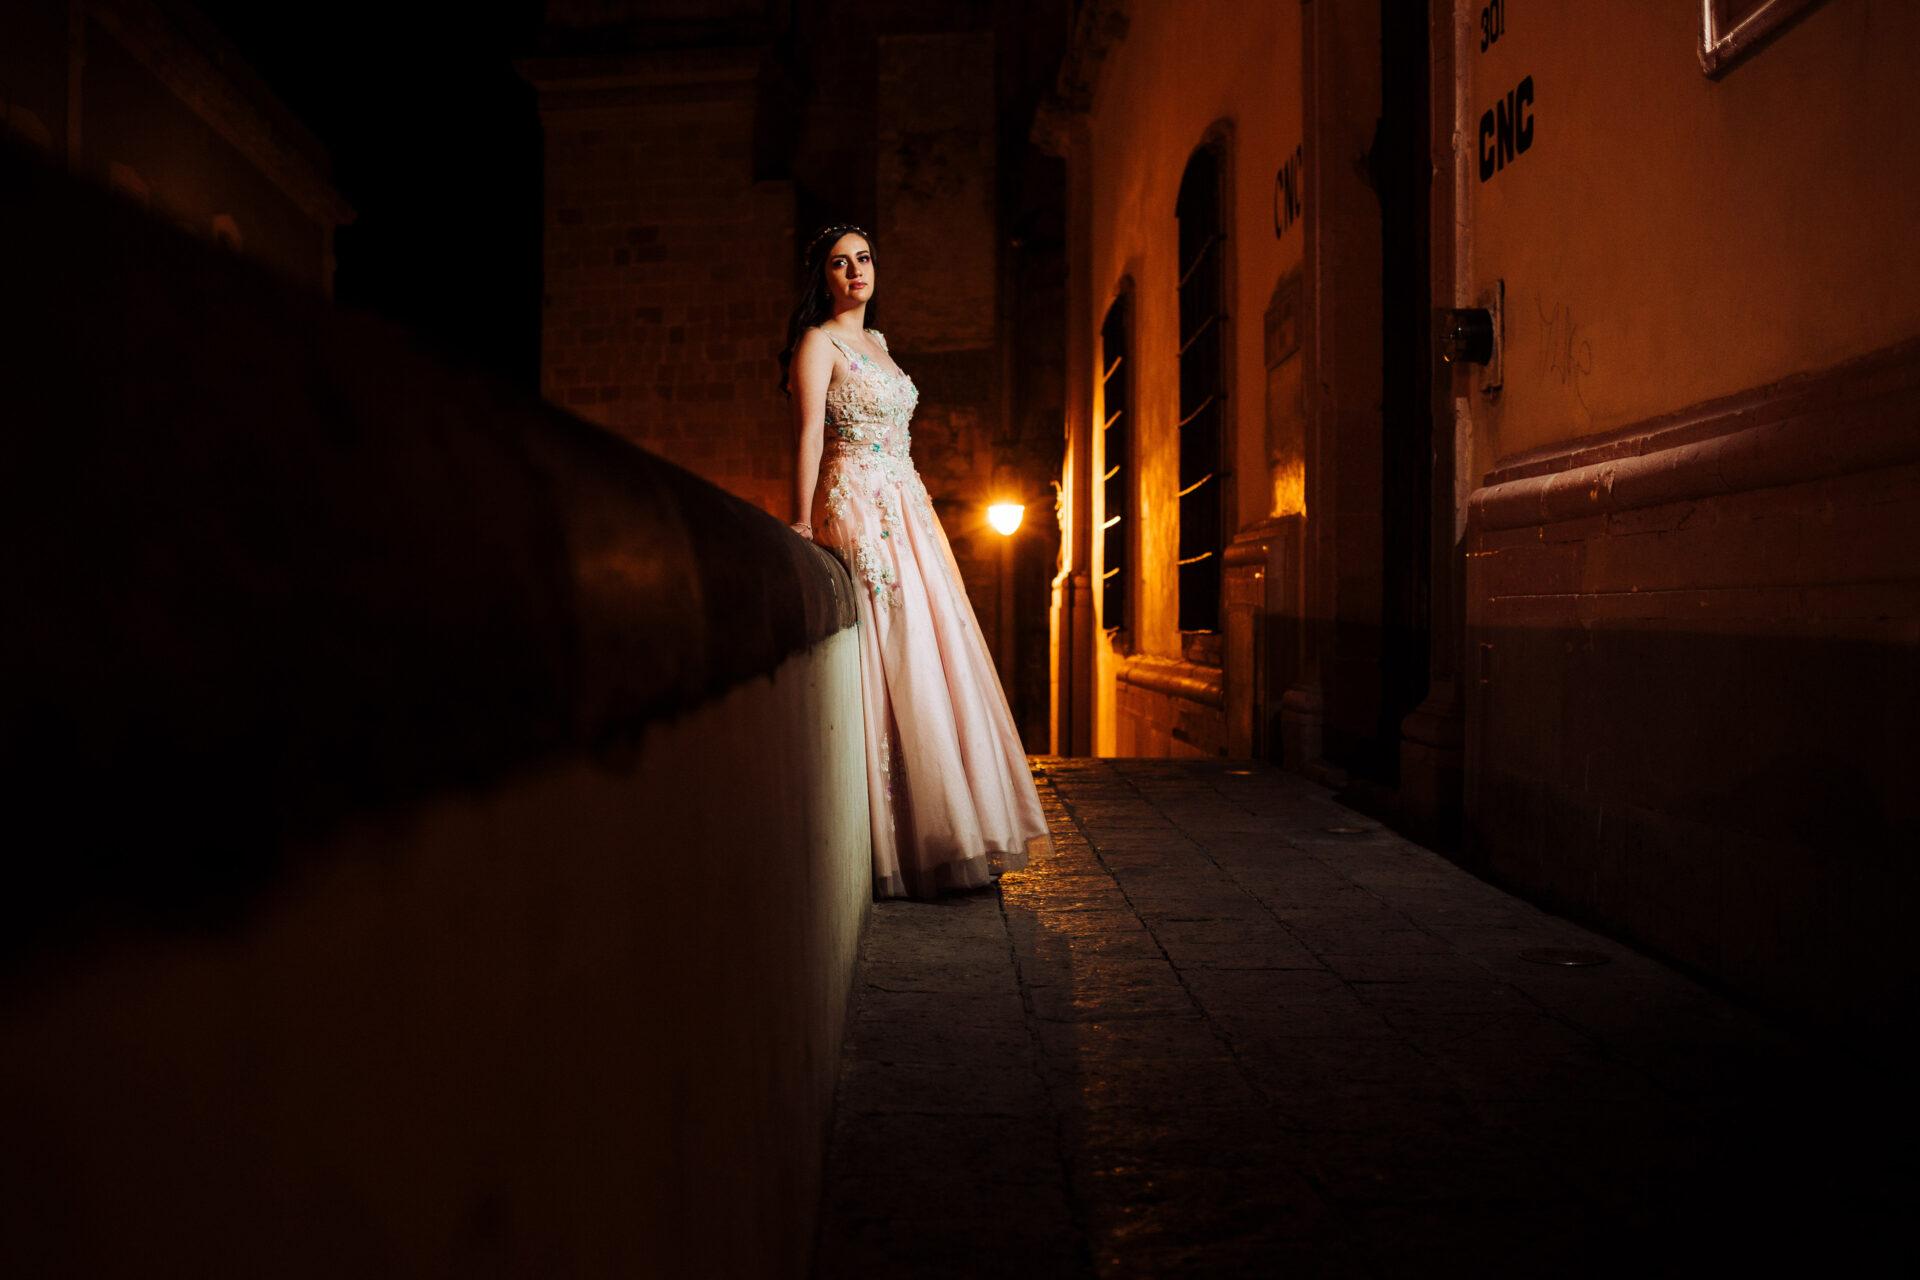 javier_noriega_fotografo_bodas_zacatecas_trash_the_dress_xv_años00003